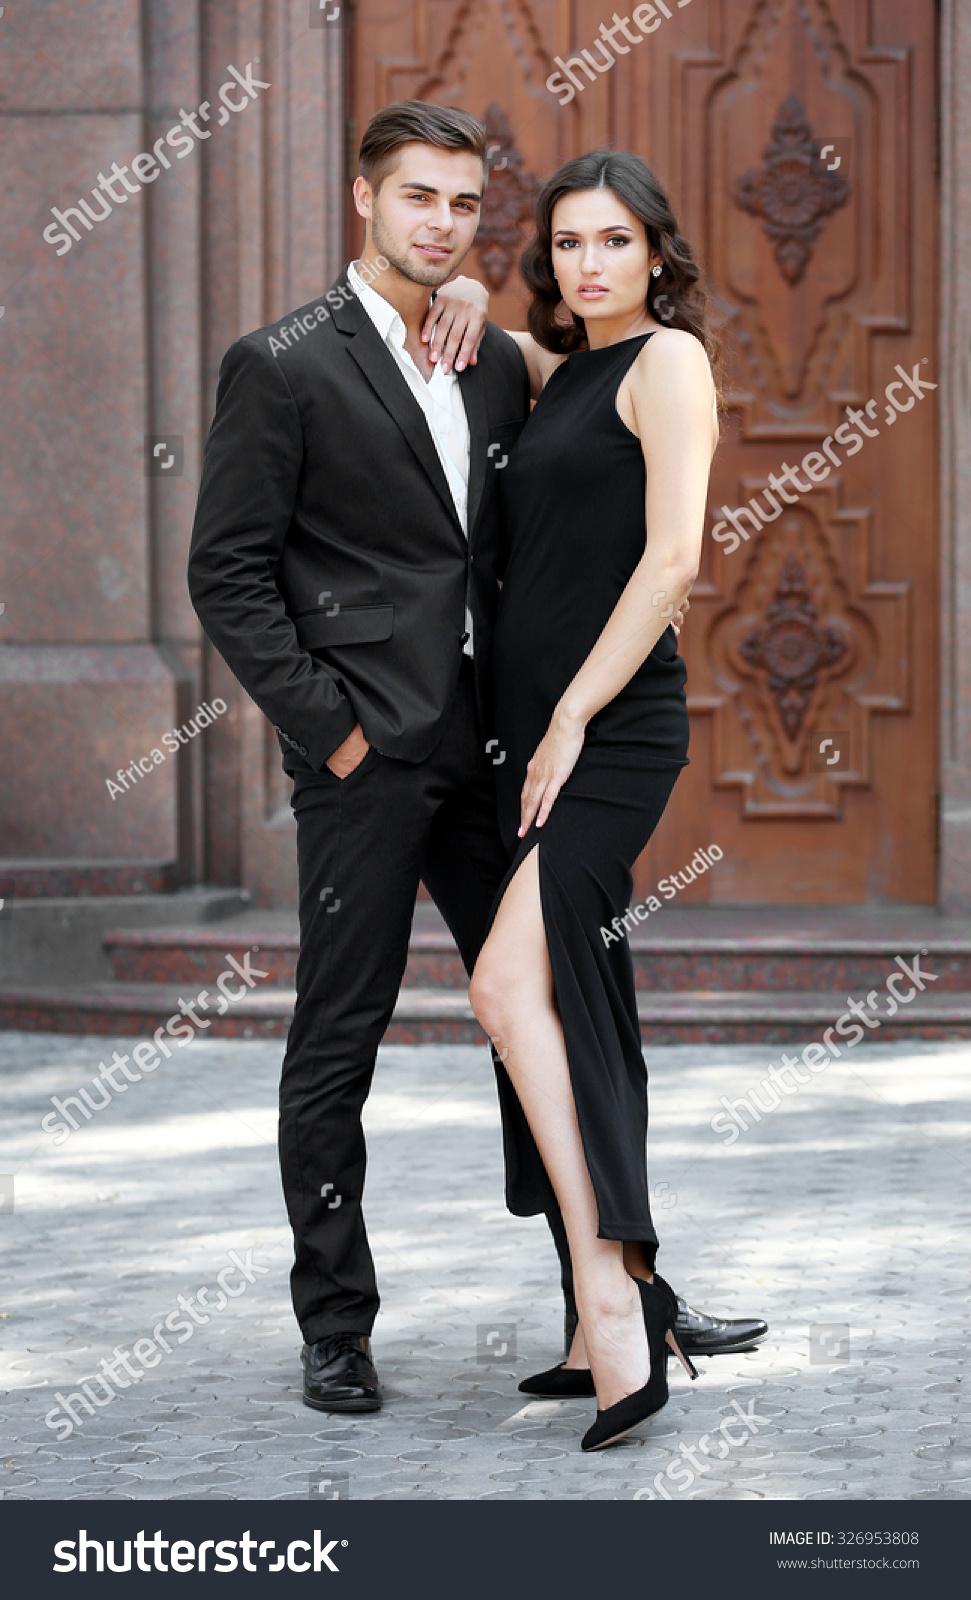 Elegant Couple Pose Outdoors Stock Photo Edit Now 326953808